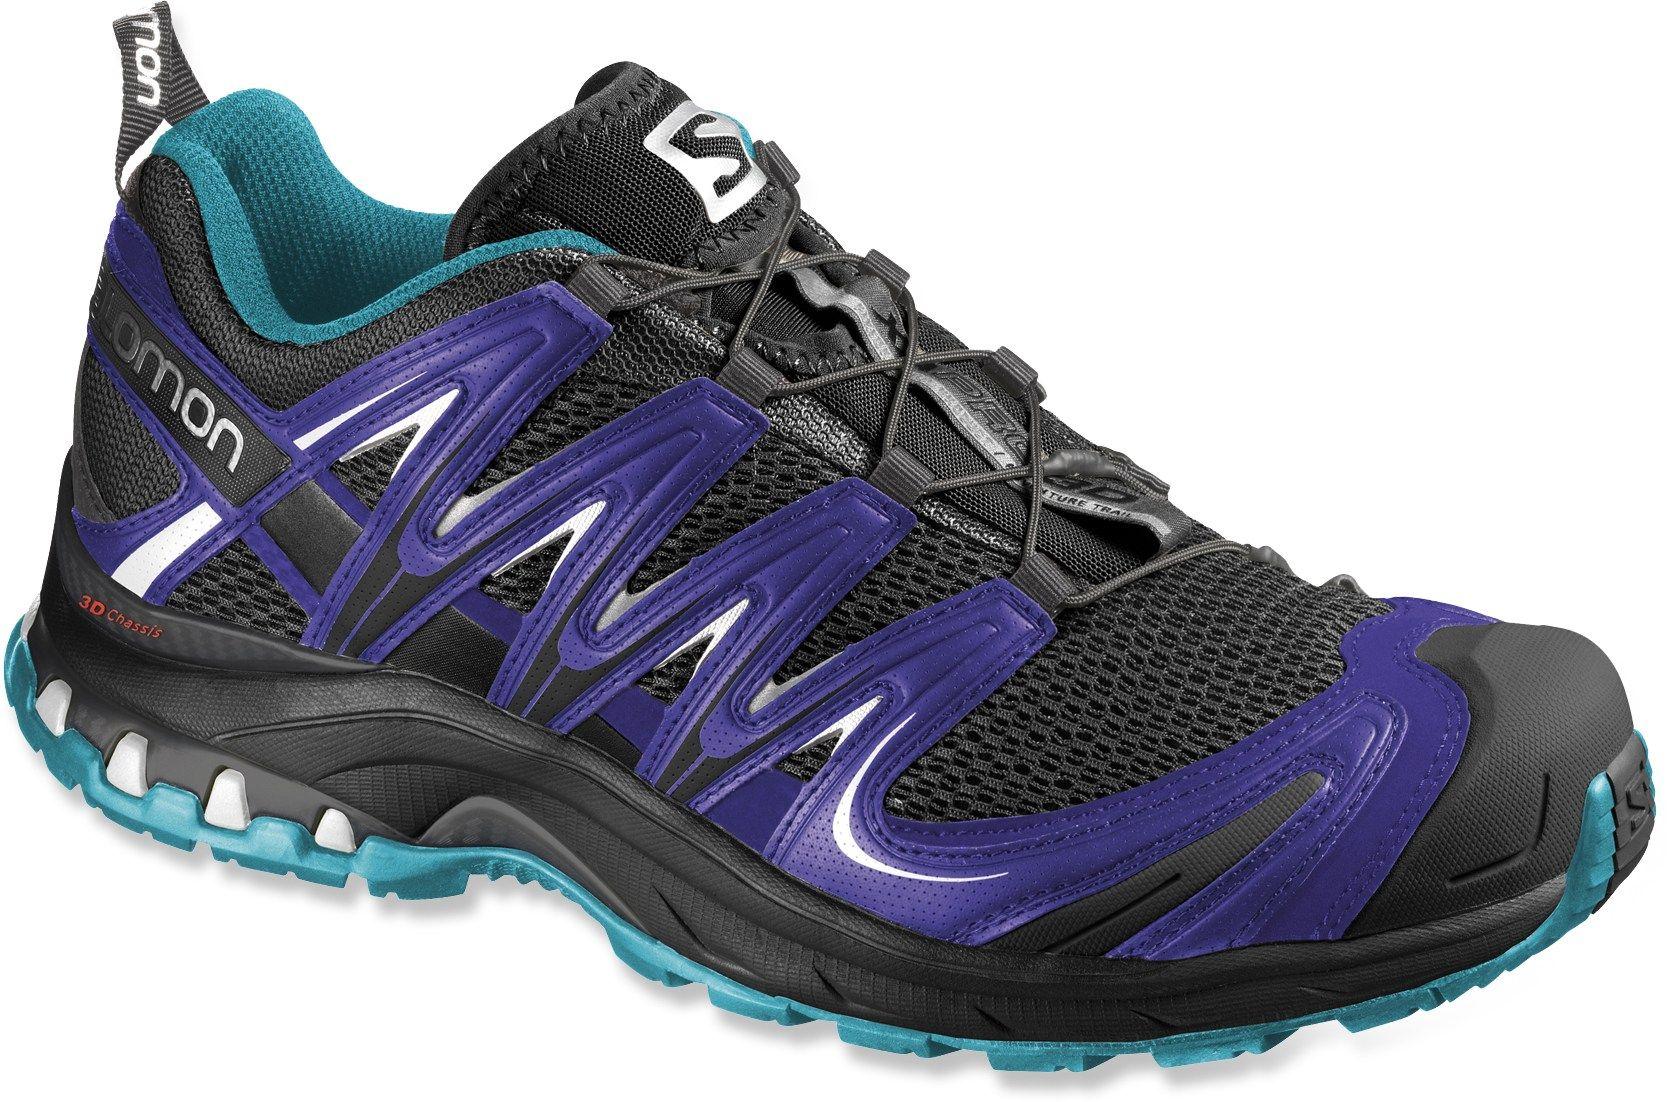 Salomon Female Xa Pro 3D Trail Running Shoes Women's